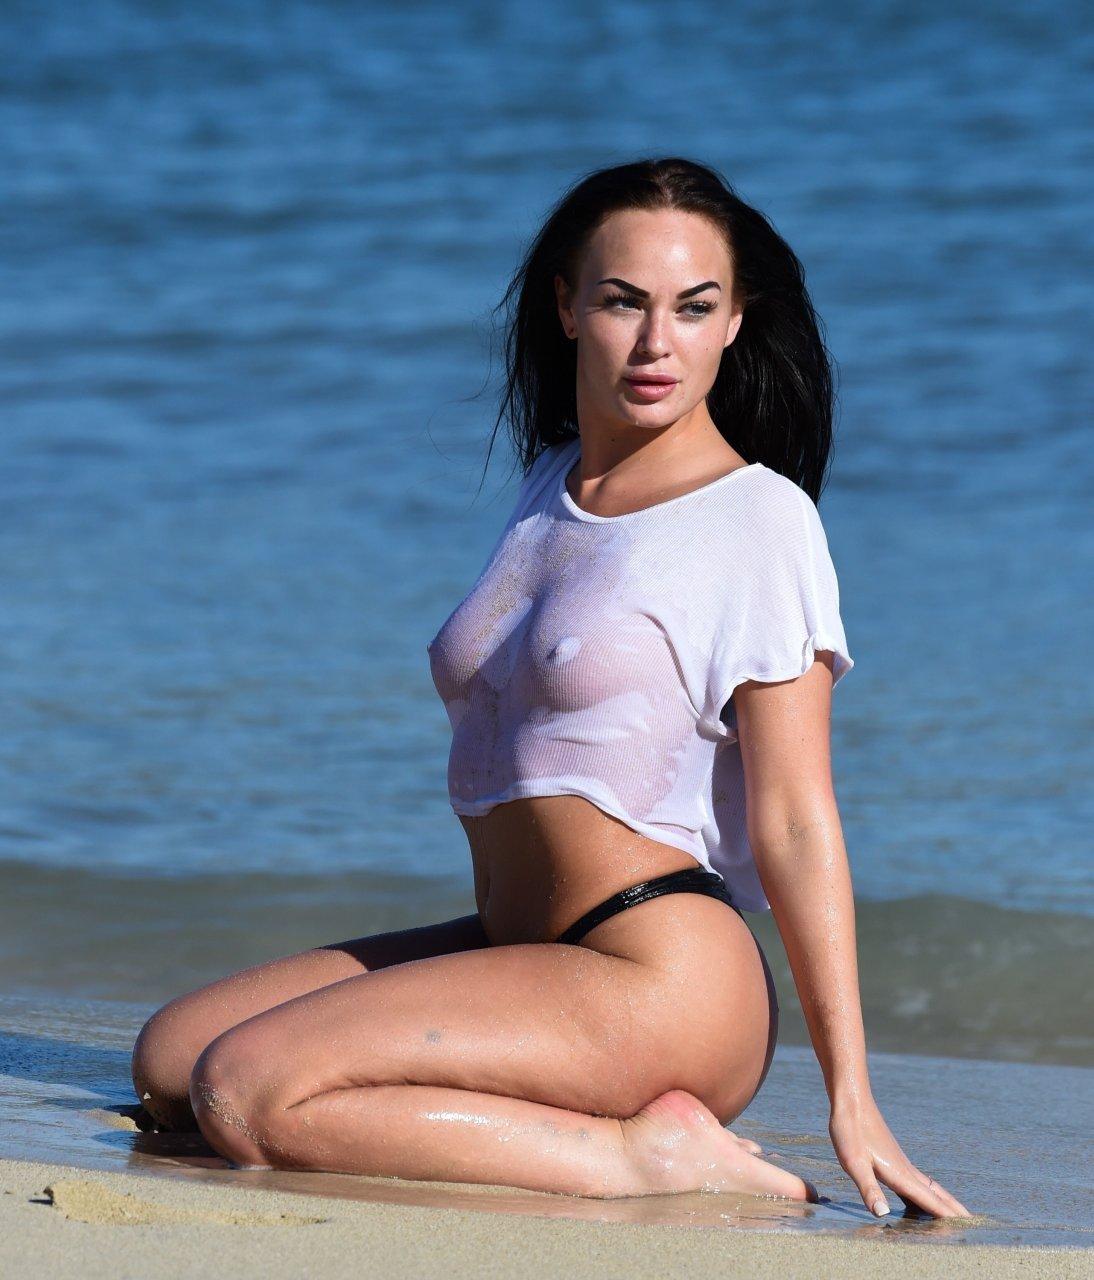 Erotica Hayley Fanshaw naked (77 foto and video), Pussy, Bikini, Selfie, underwear 2020